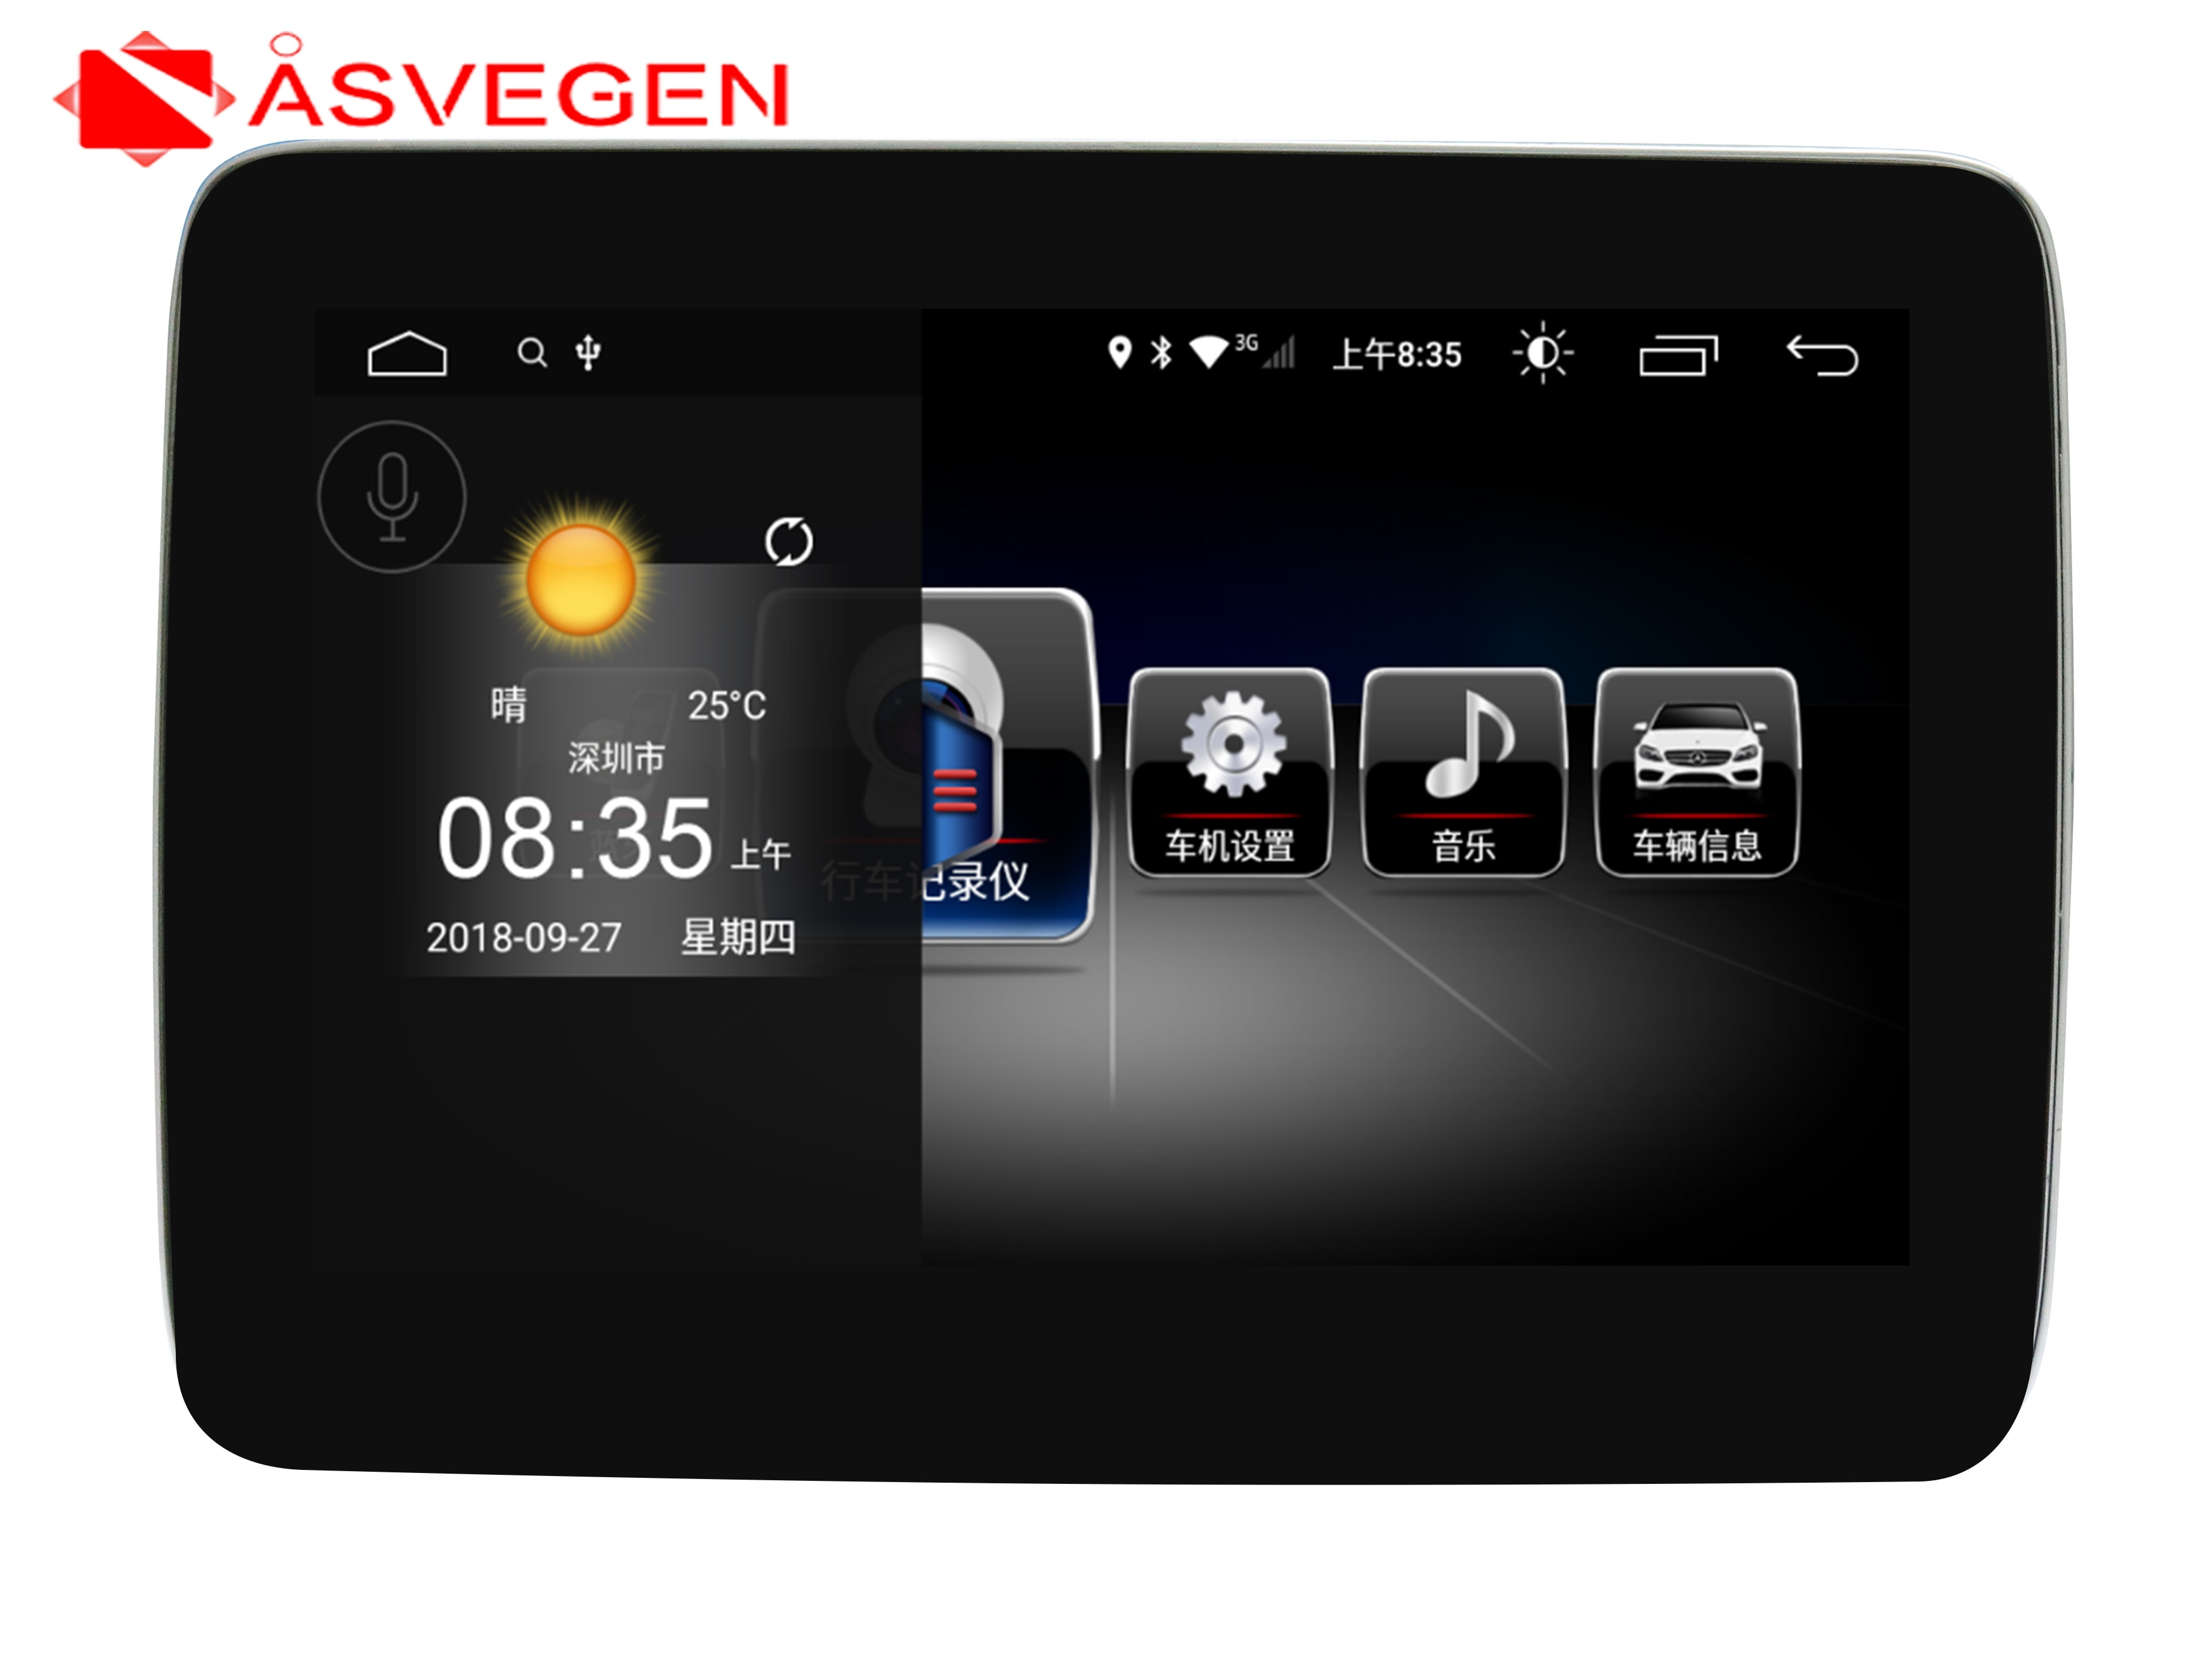 "8.4"" Android8.1 Car Radio Multimedia Player For Mercedes Benz ML ML350 ML320 ML280 GL350 GL450 Ram 4G 64G Auto Car Stereo GPS"